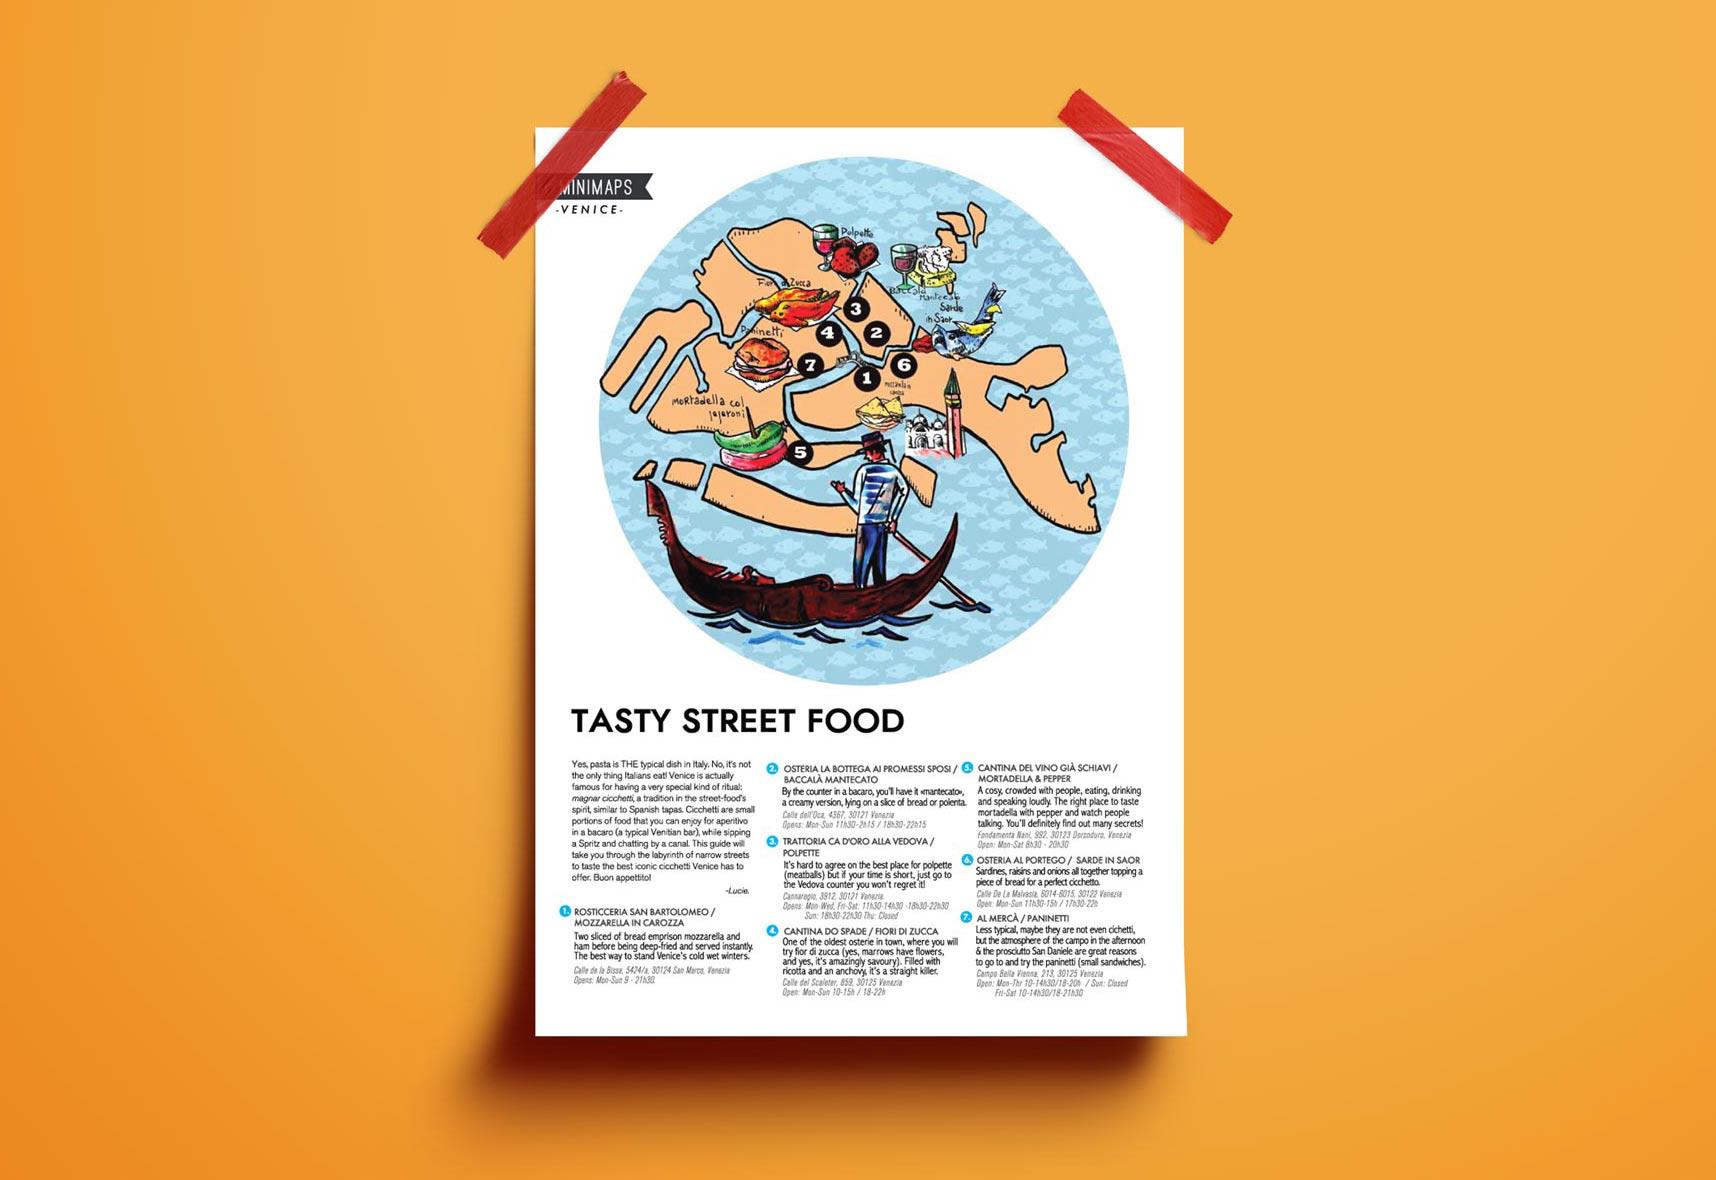 Venice-MINIMAP-TASTY FOOD